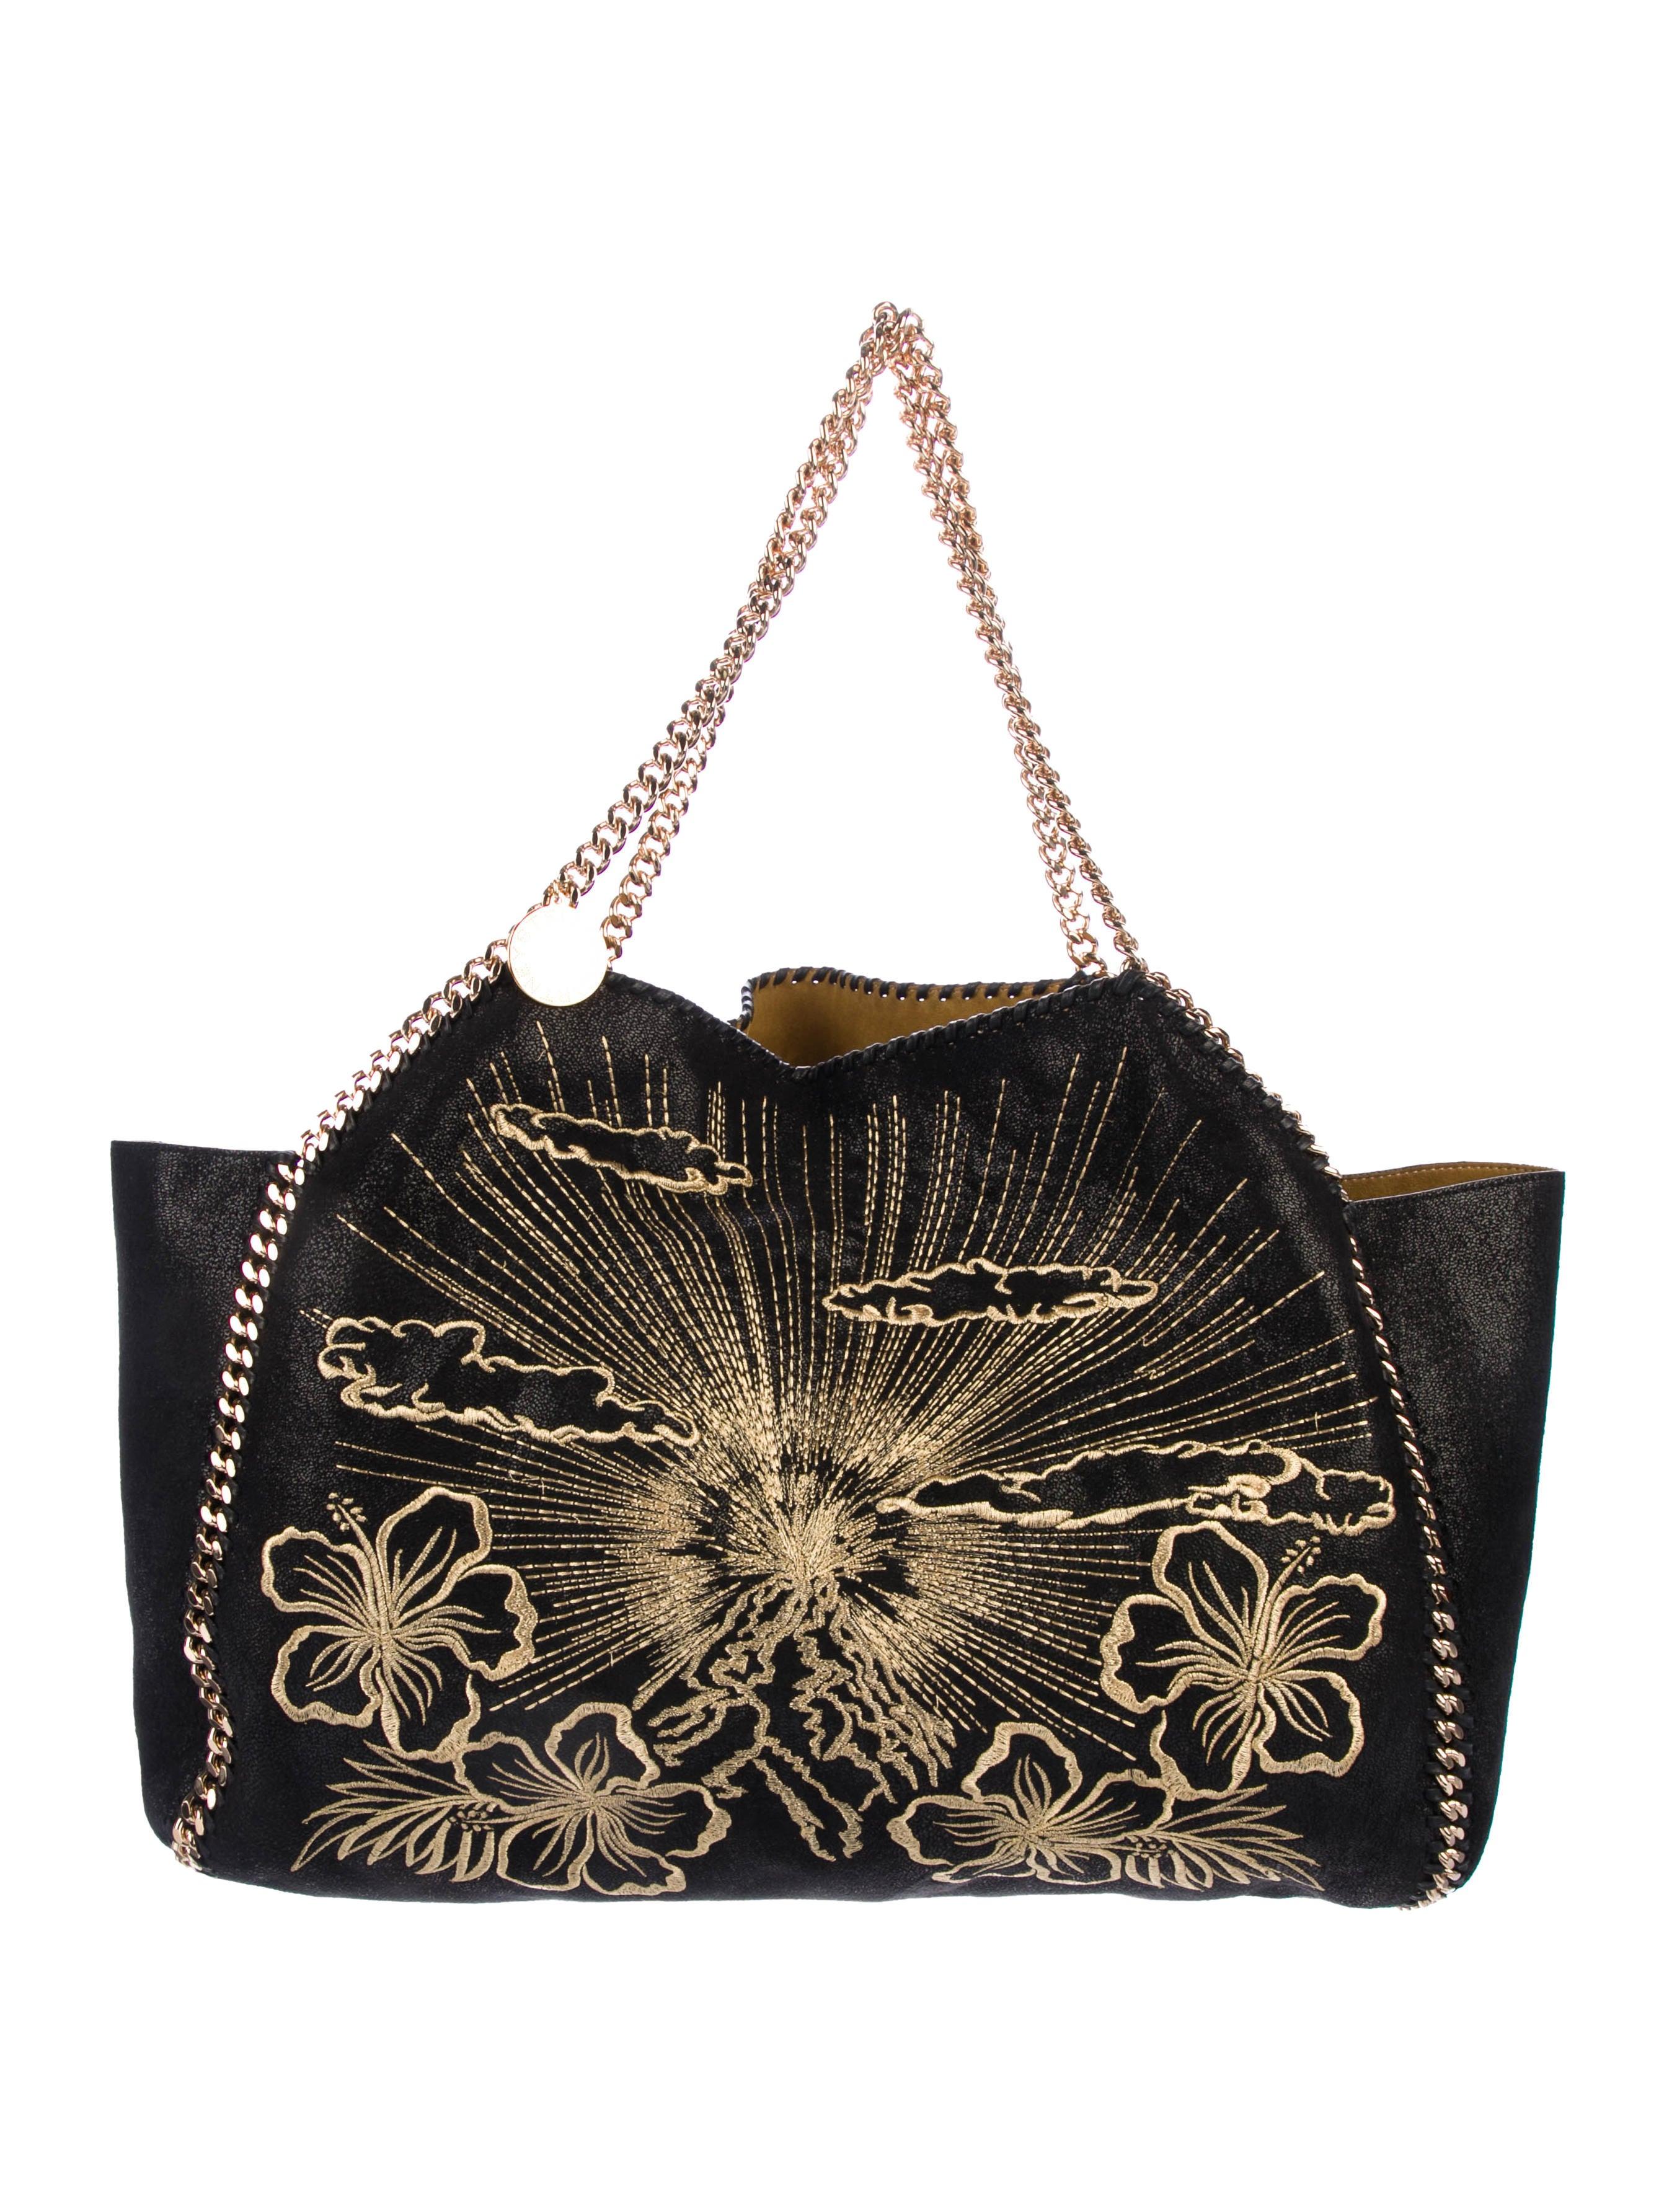 266009ef4130 Stella McCartney Spring 2018 Black Volcano Gold Embroidery Tote Bag ...